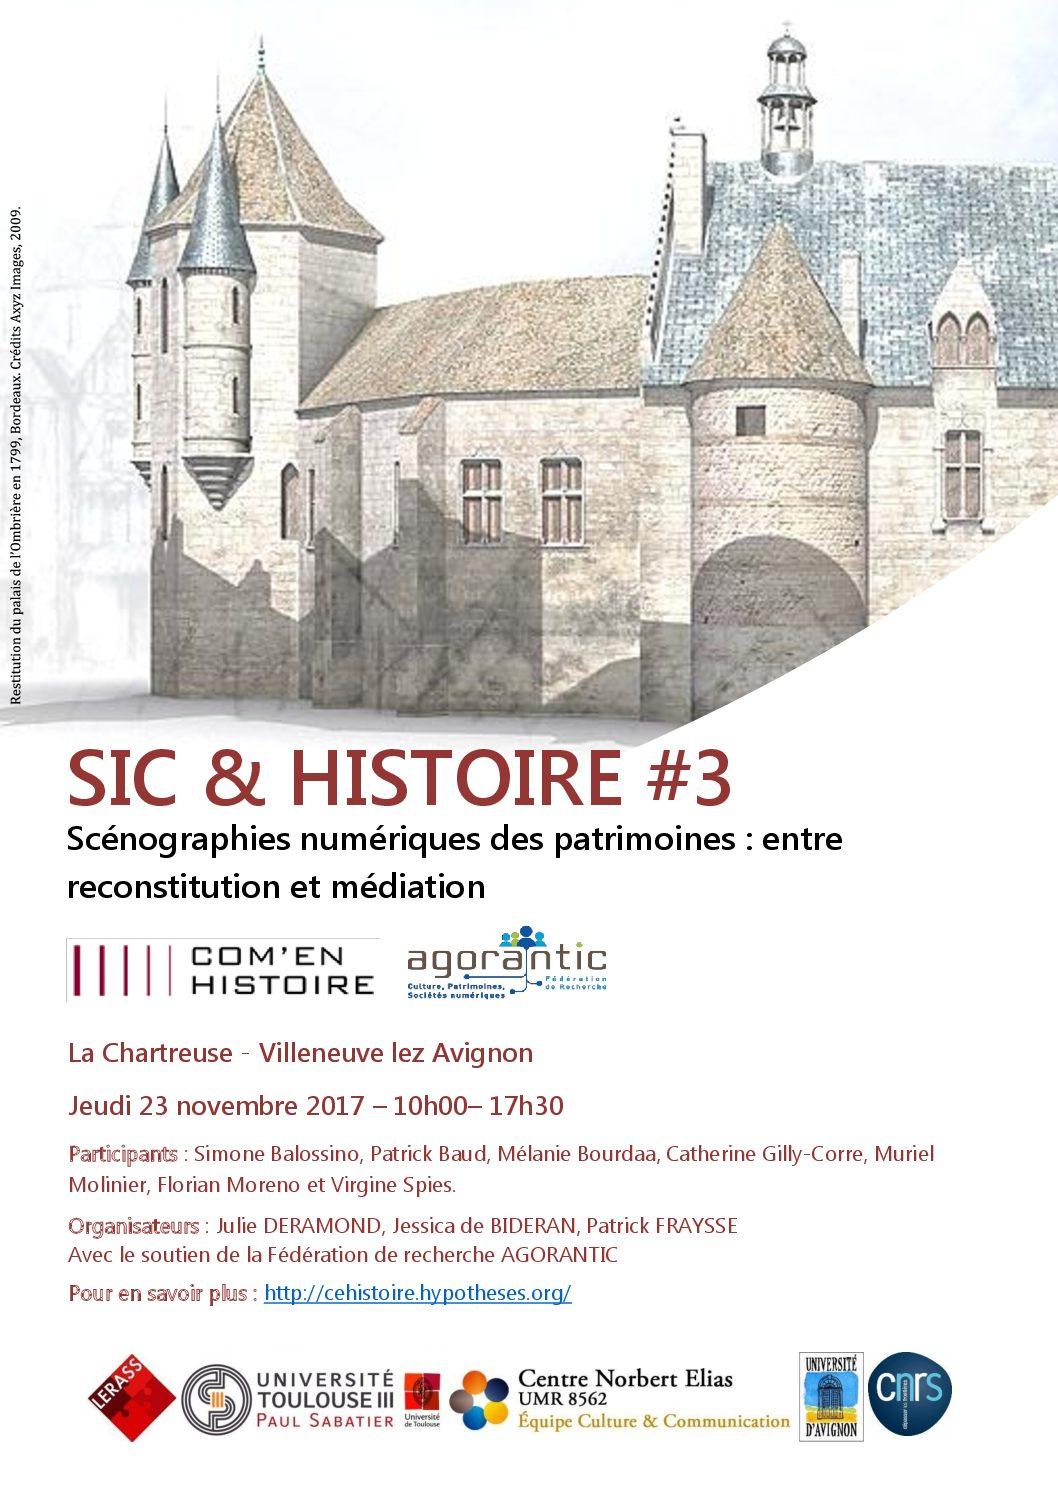 Sic & Histoire #3